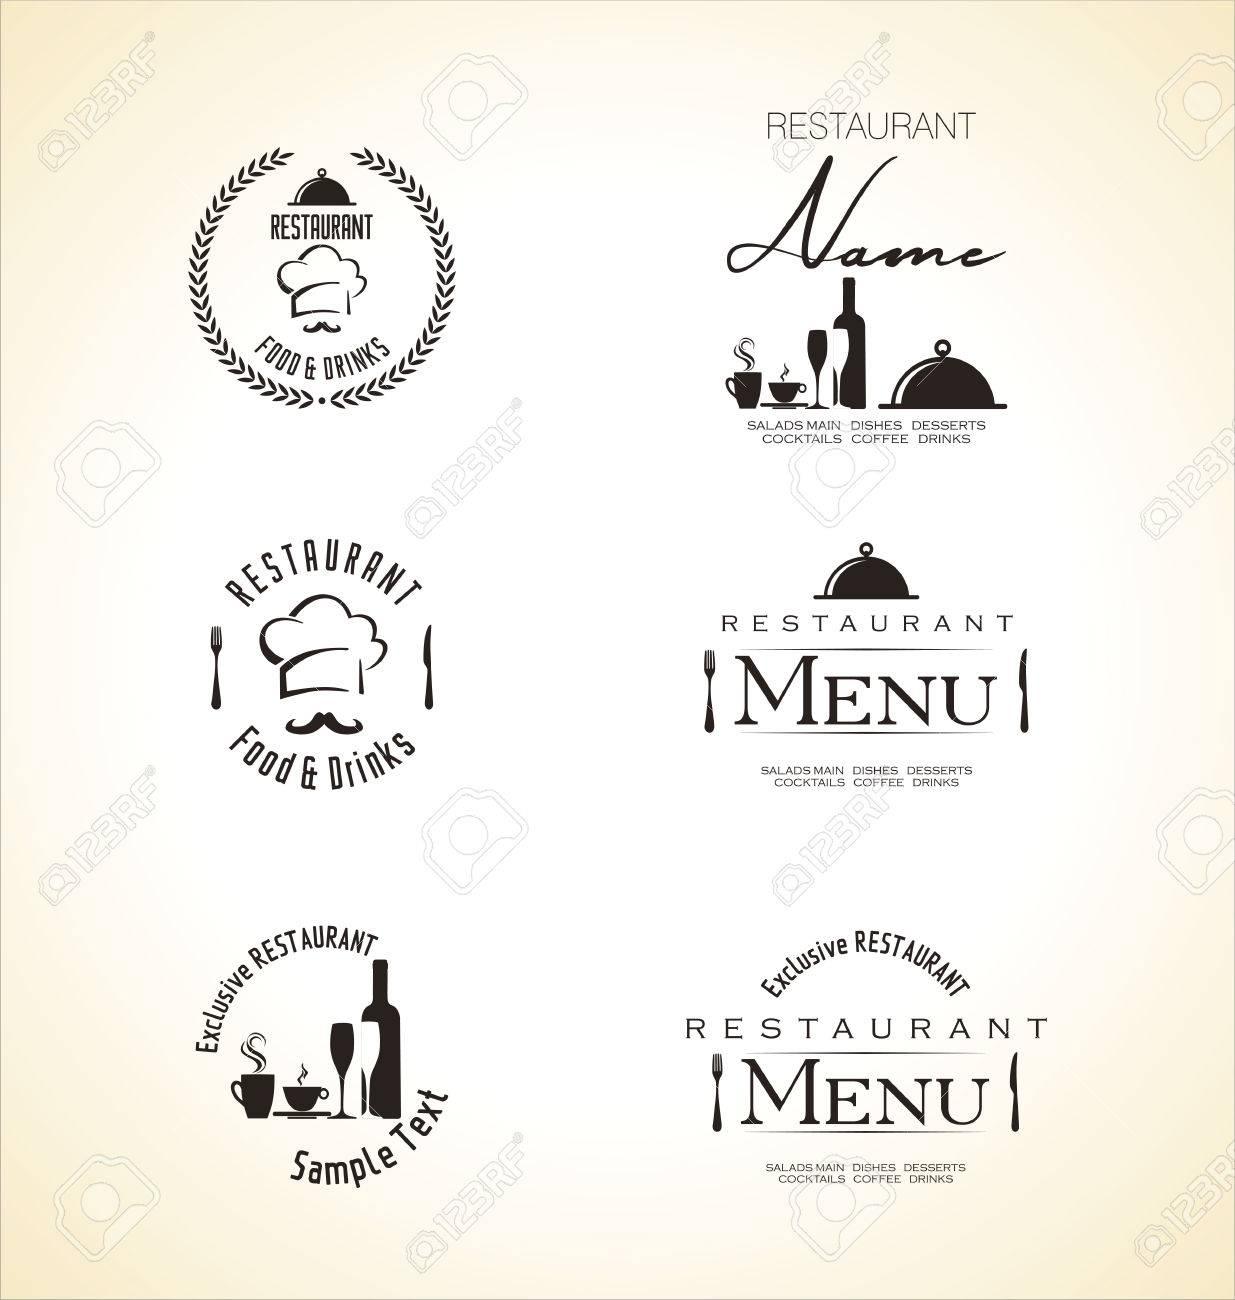 Restaurant menu design - 31496397